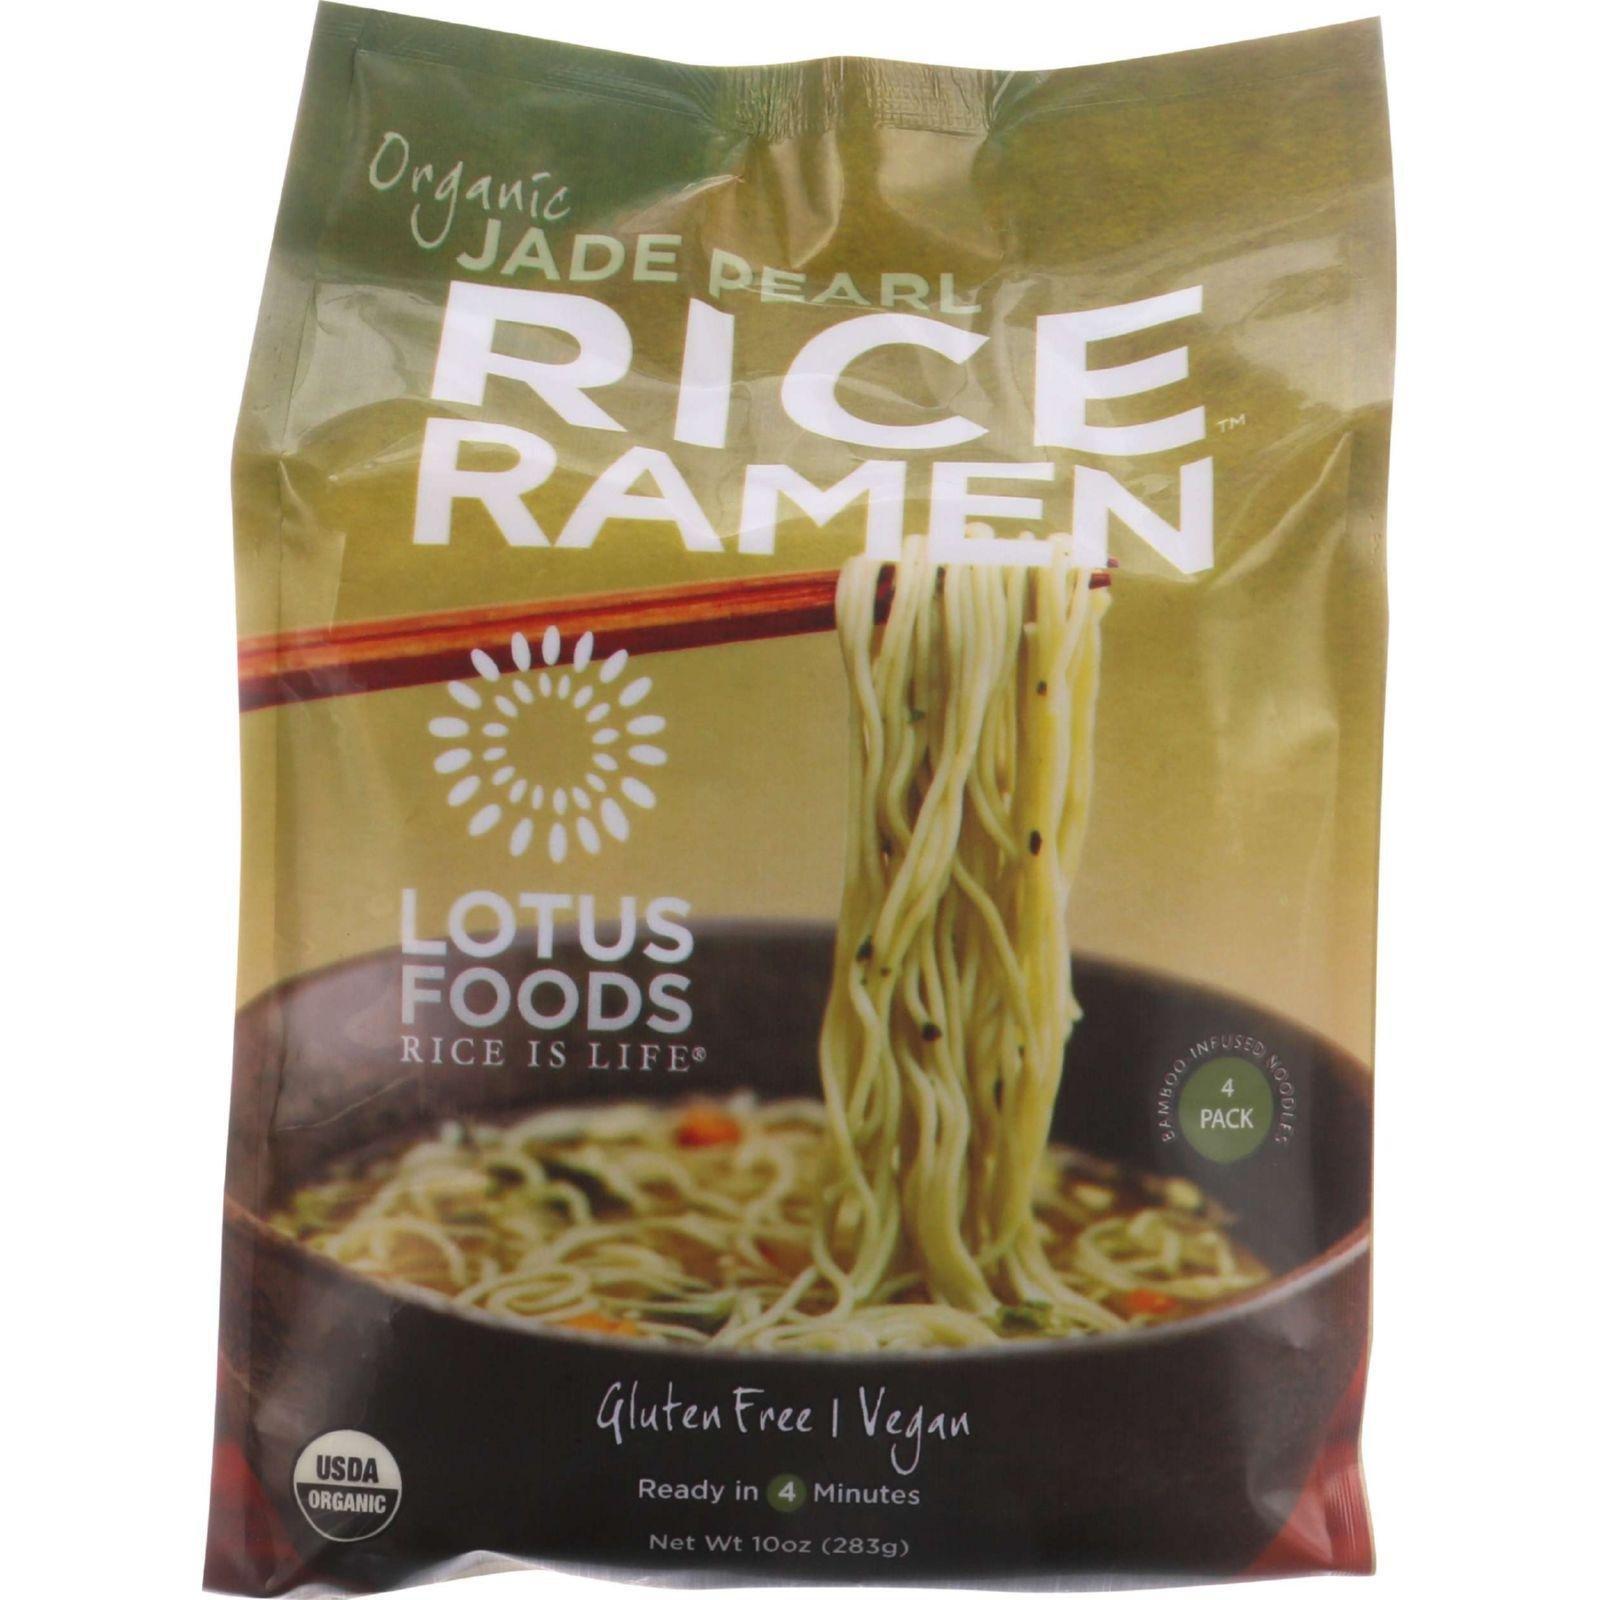 Lotus Foods Rice Ramen Noodles with Miso Soup